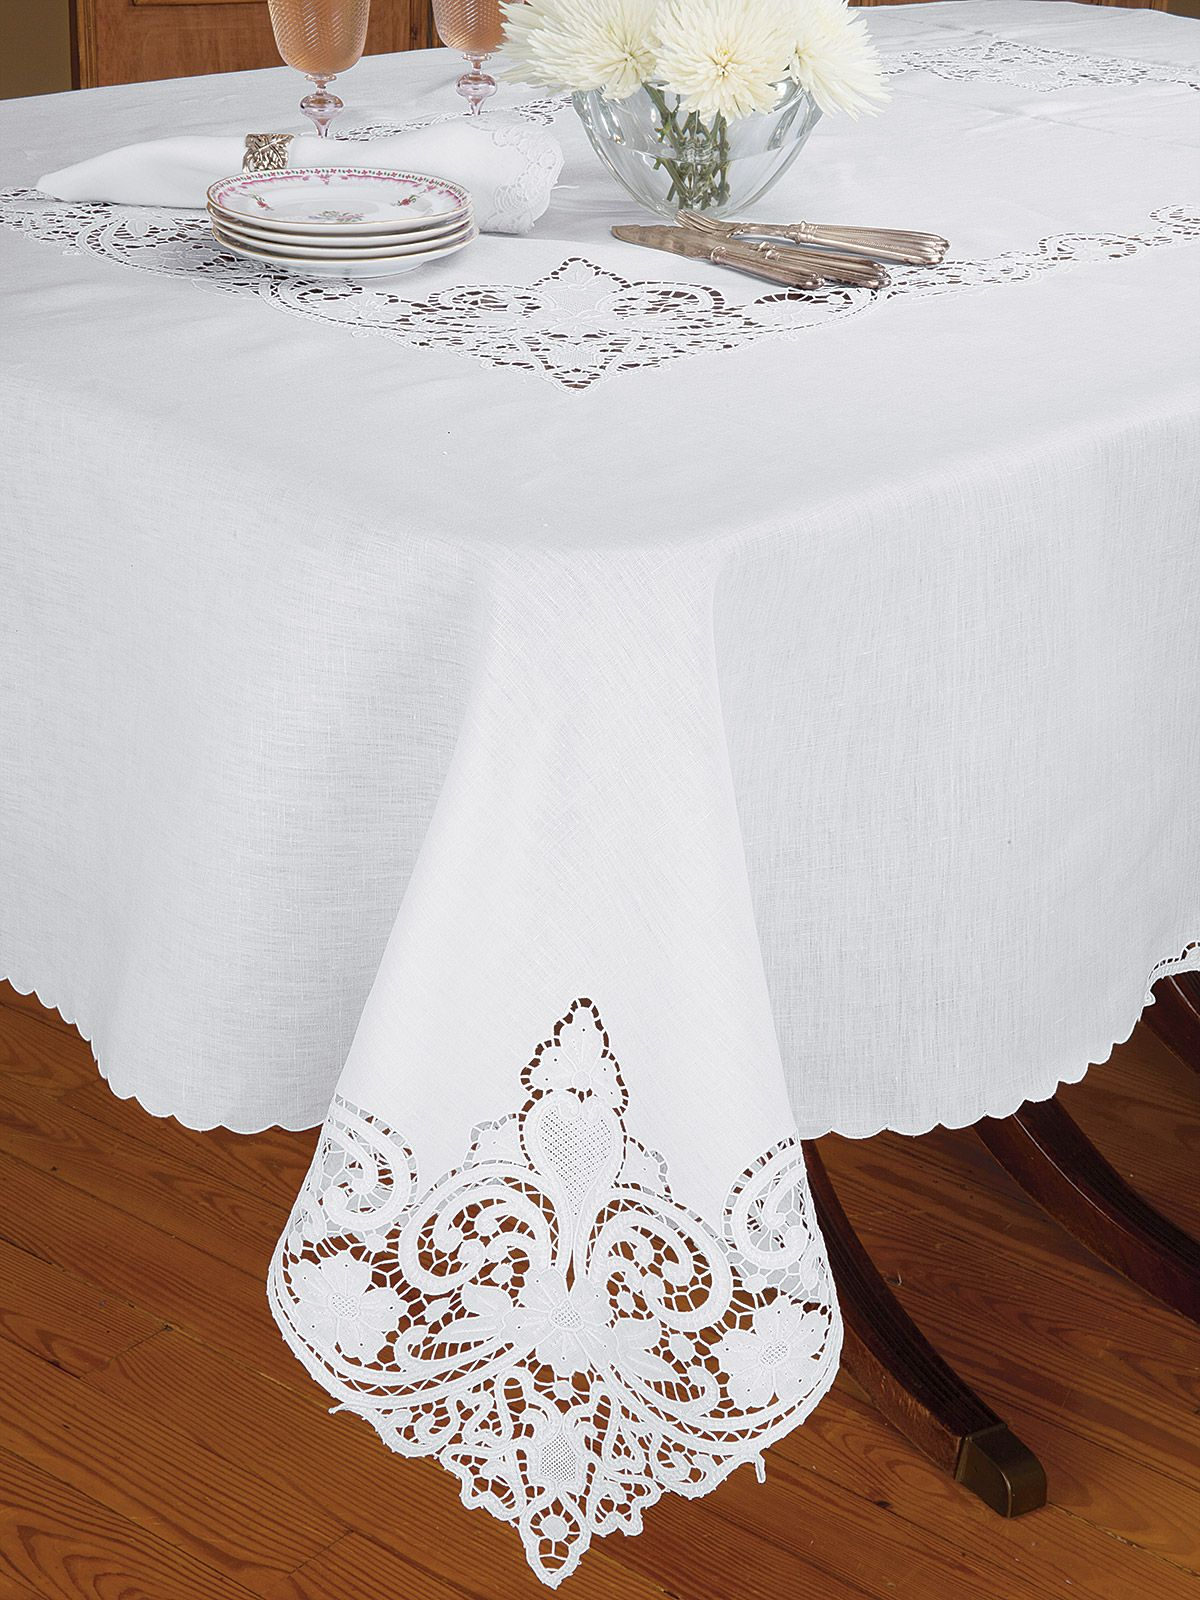 Seville Fine Table Linens Schweitzer Linen Toalhas De Mesa